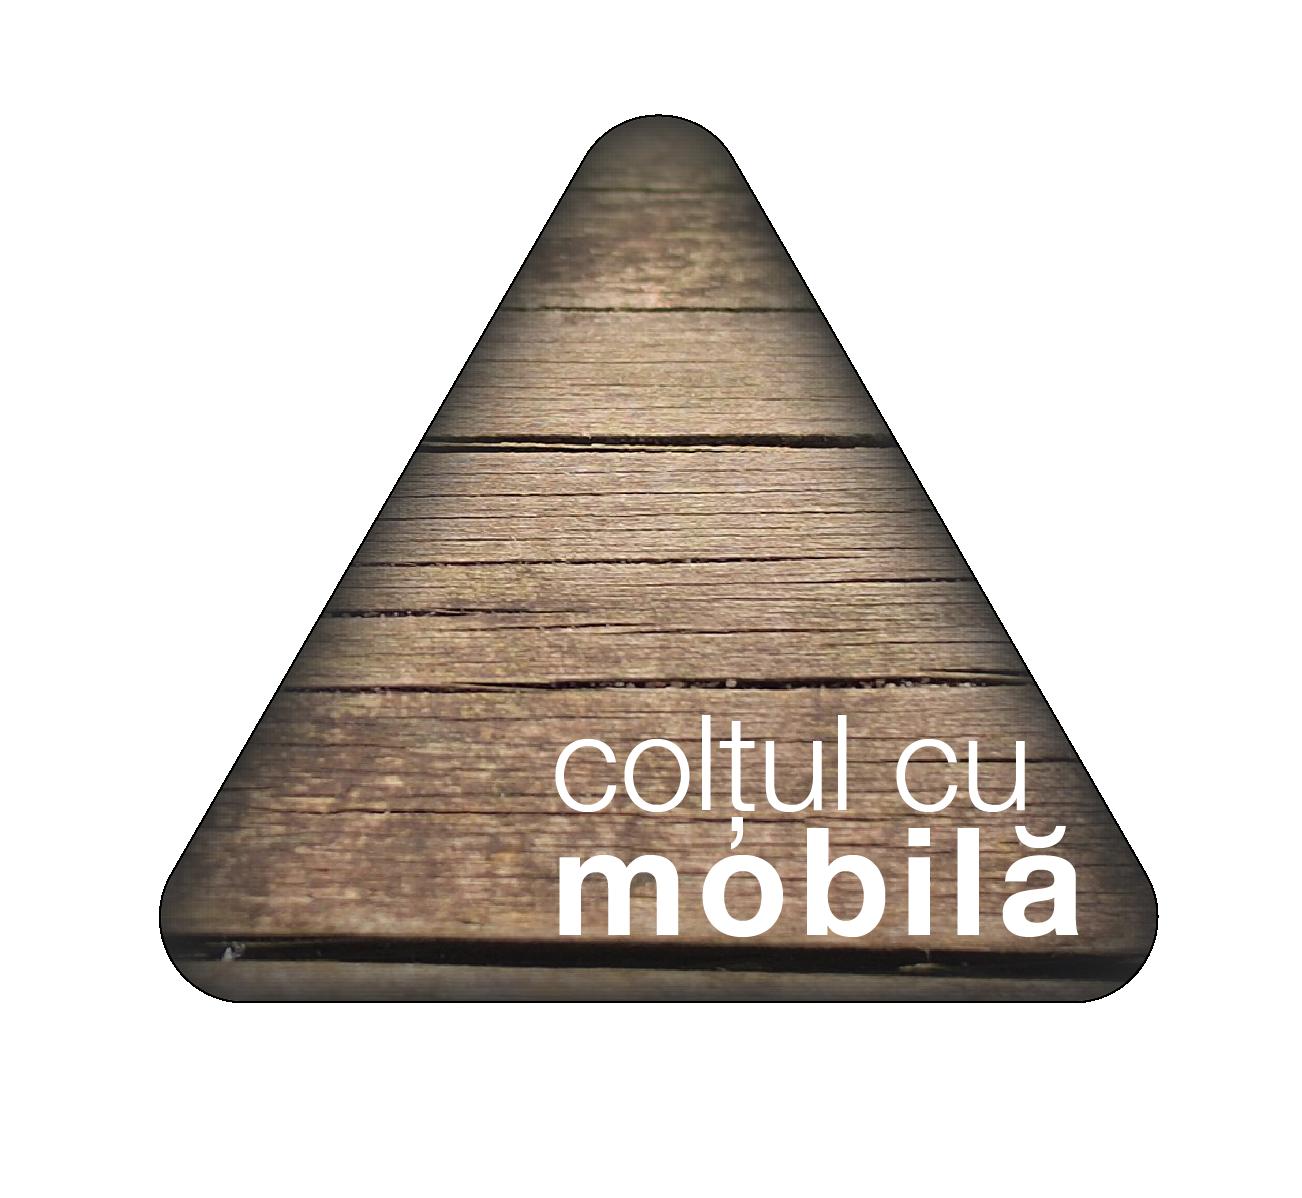 http://coltul-cu-mobila.ro/